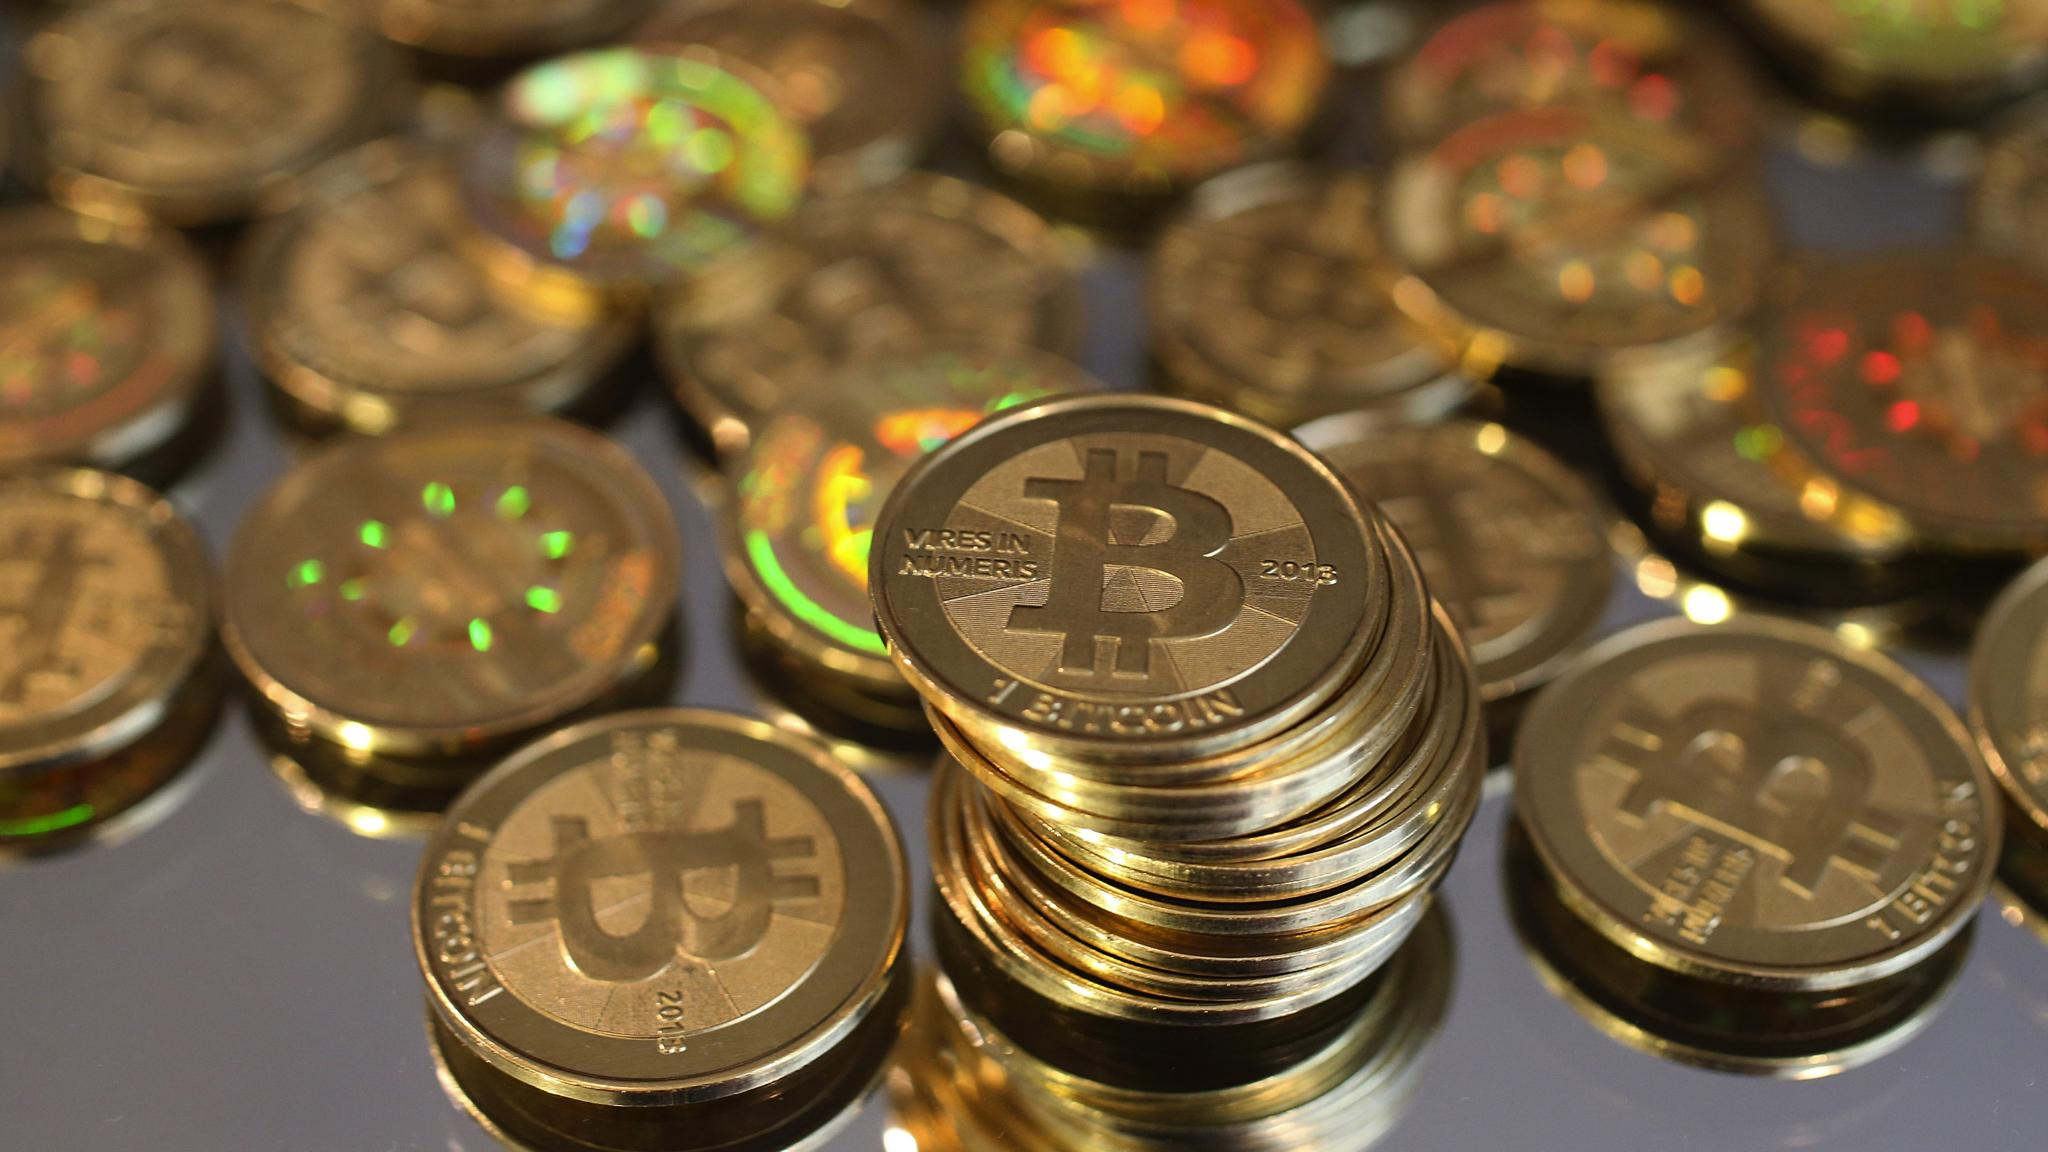 marketwatch bitcoin group se bitcoin bináris opciós platform